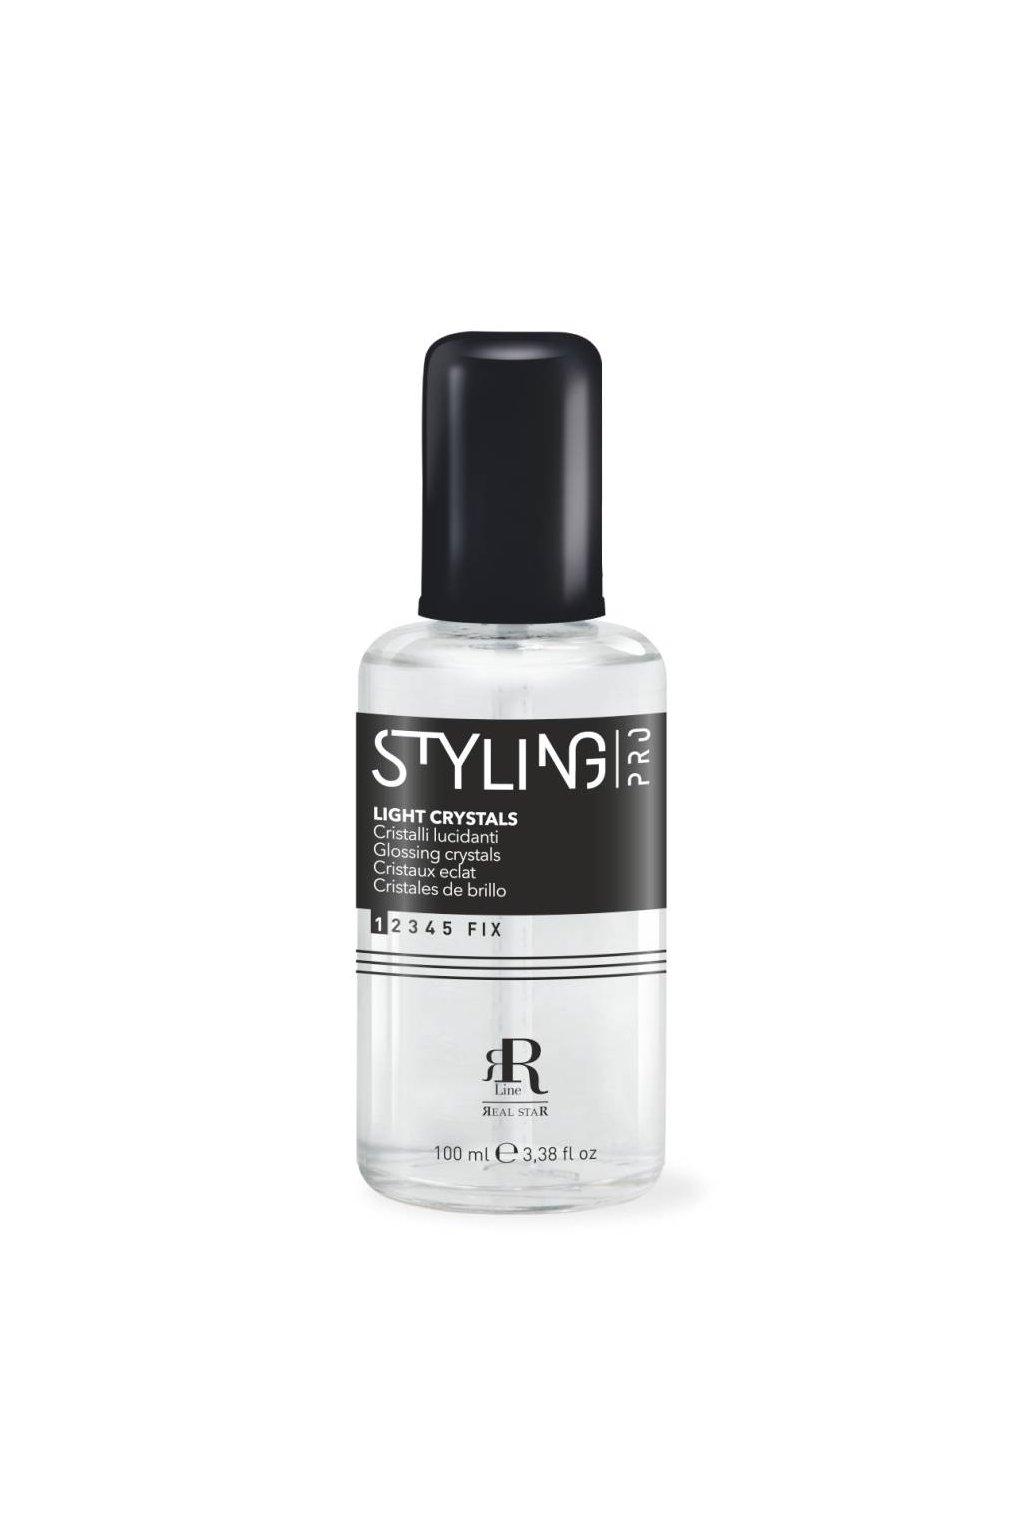 RR Line LIGHT CRYSTALS sérum třpytivé krystaly pro lesk a hebkost vlasů 100ml